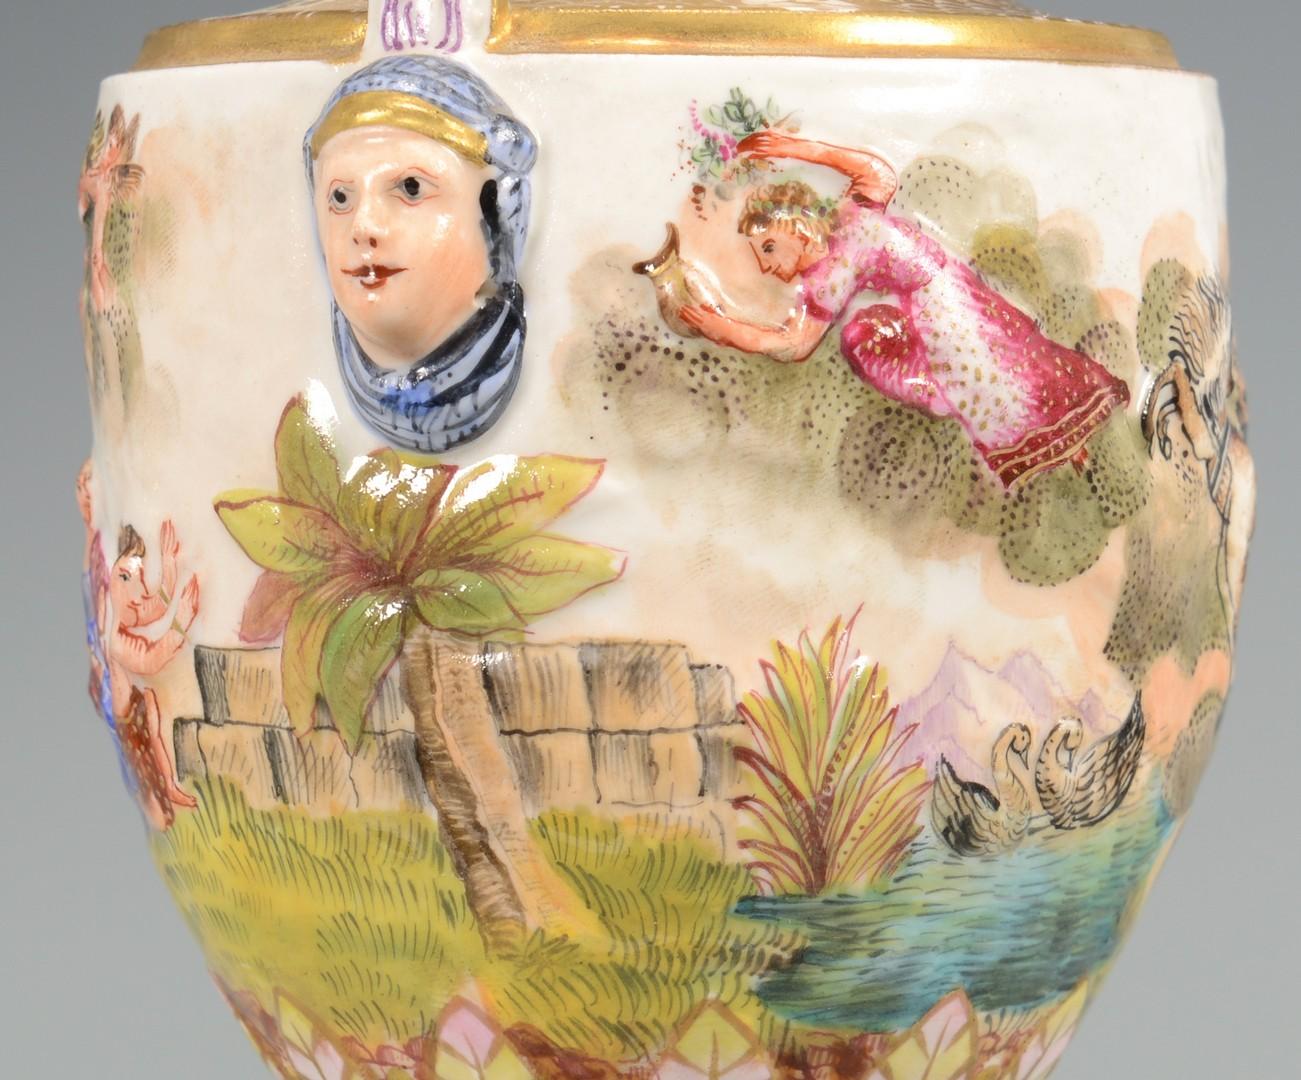 Lot 612: Two European Porcelain Urns